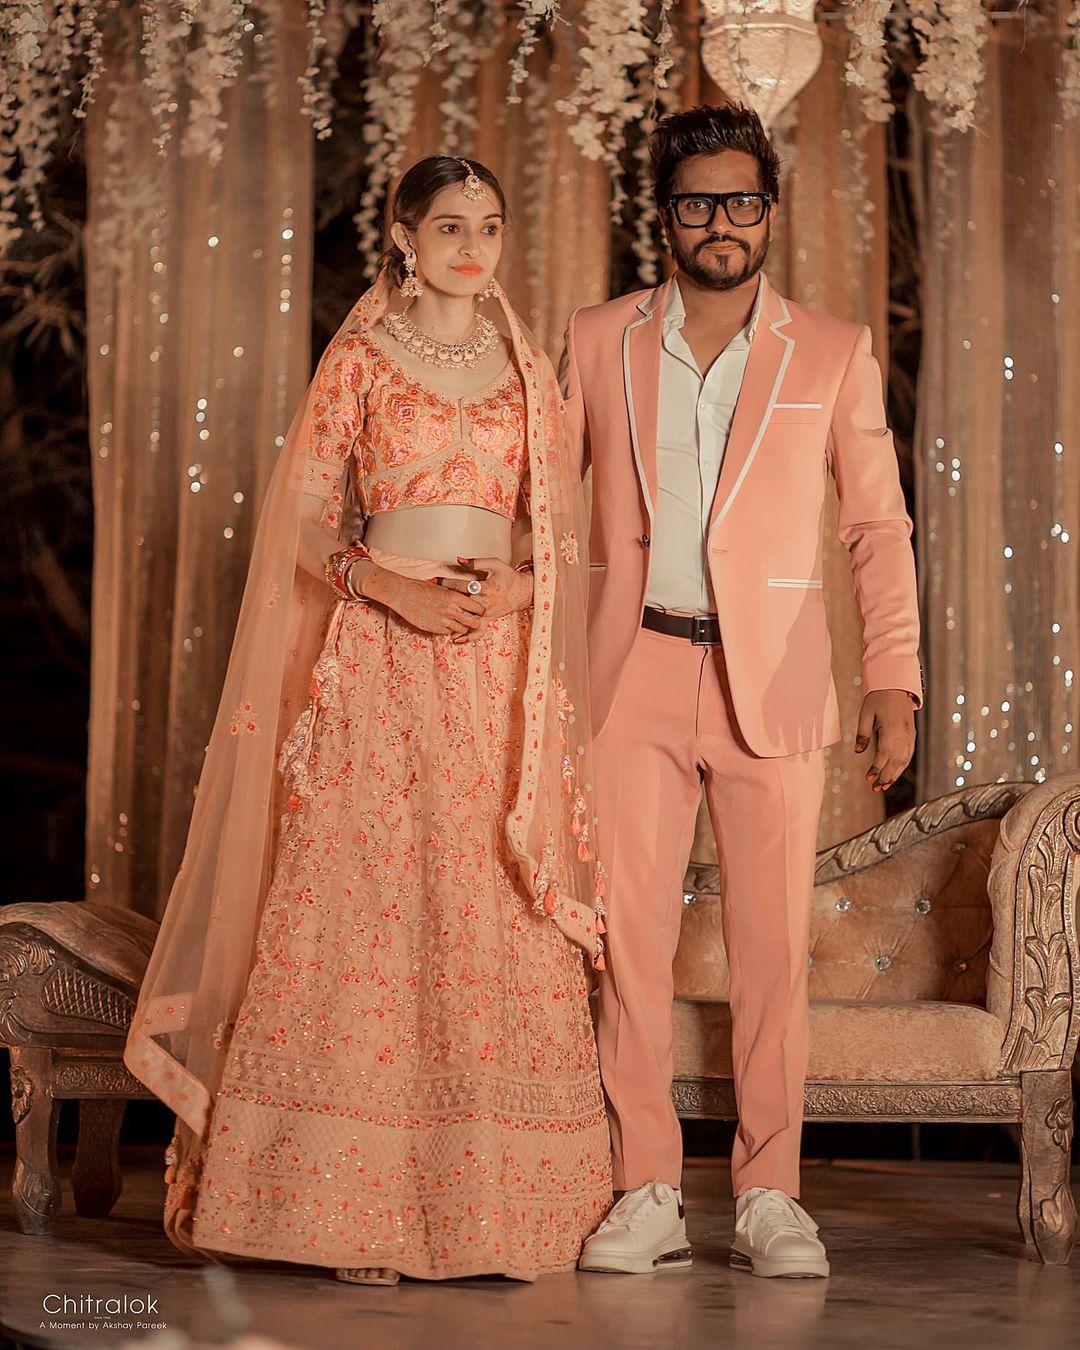 Kunaal Verma & Kavita Sharma mehendi